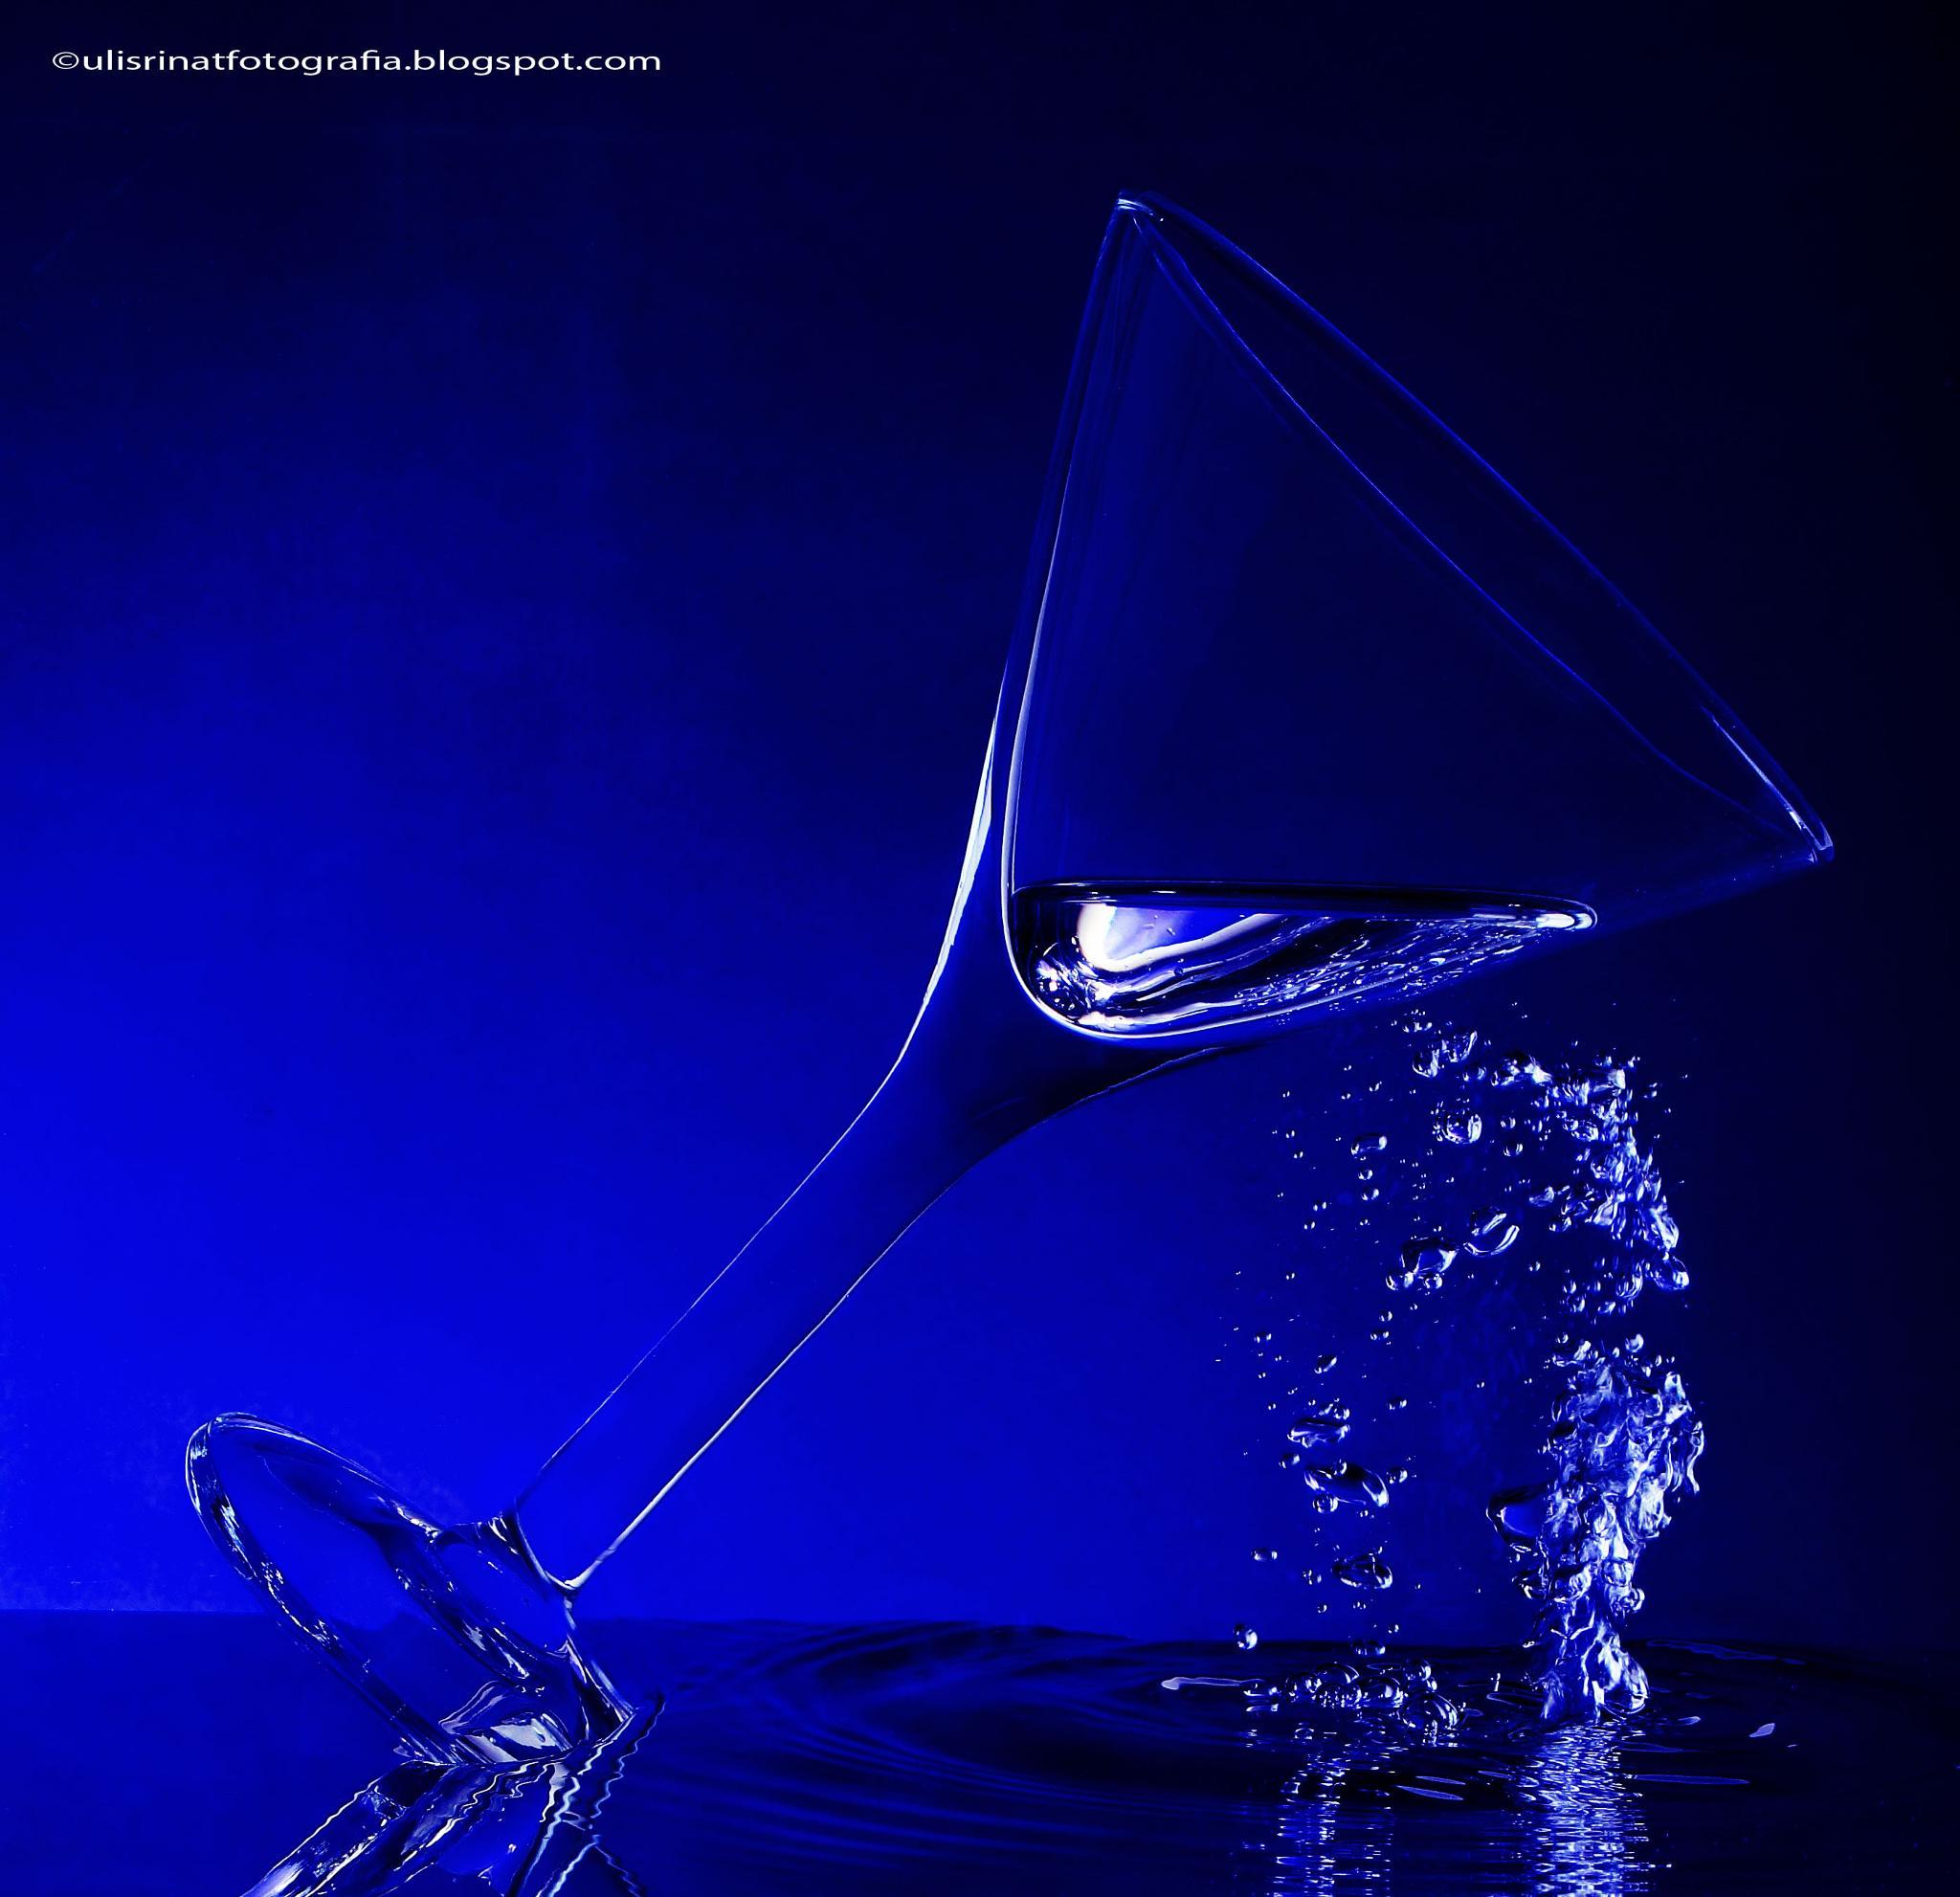 Untitled by ulis rinat fotografia